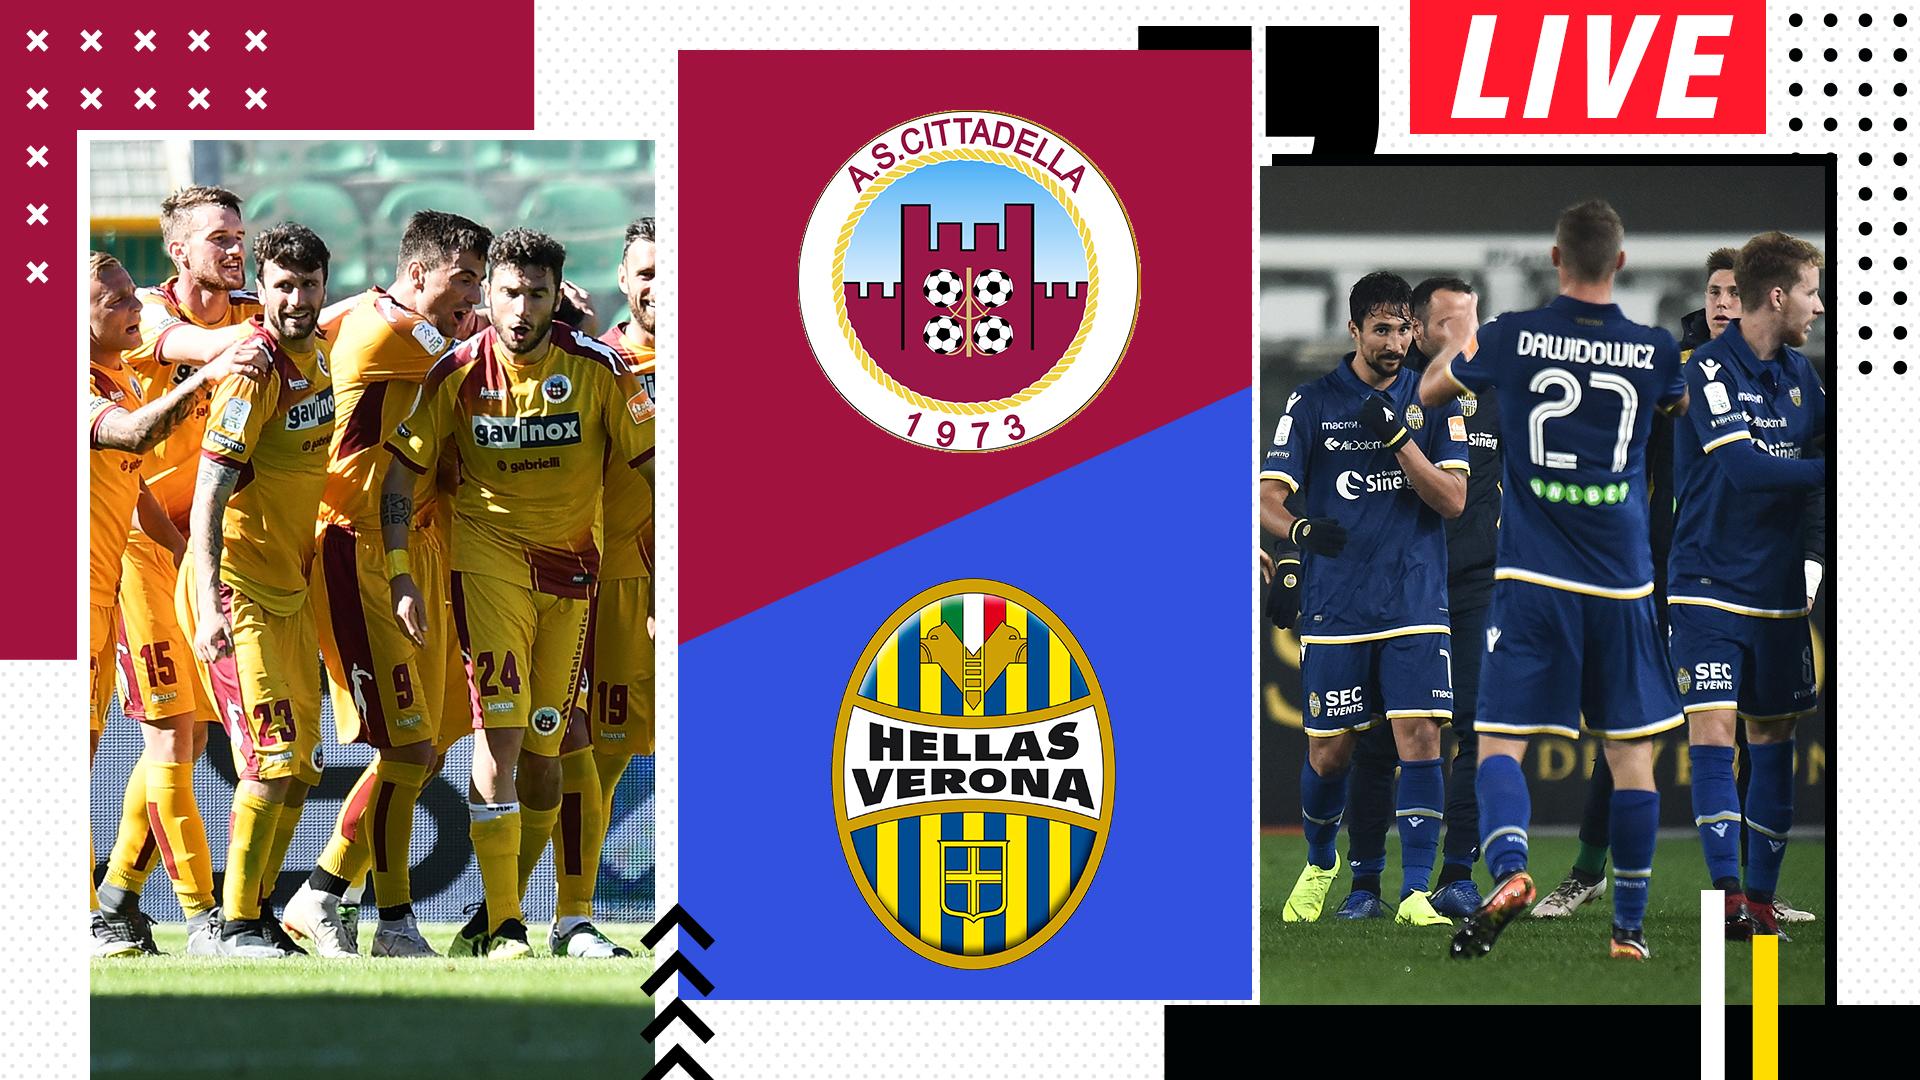 Diretta Cittadella Verona Live 2 0 Diaw Goal Com